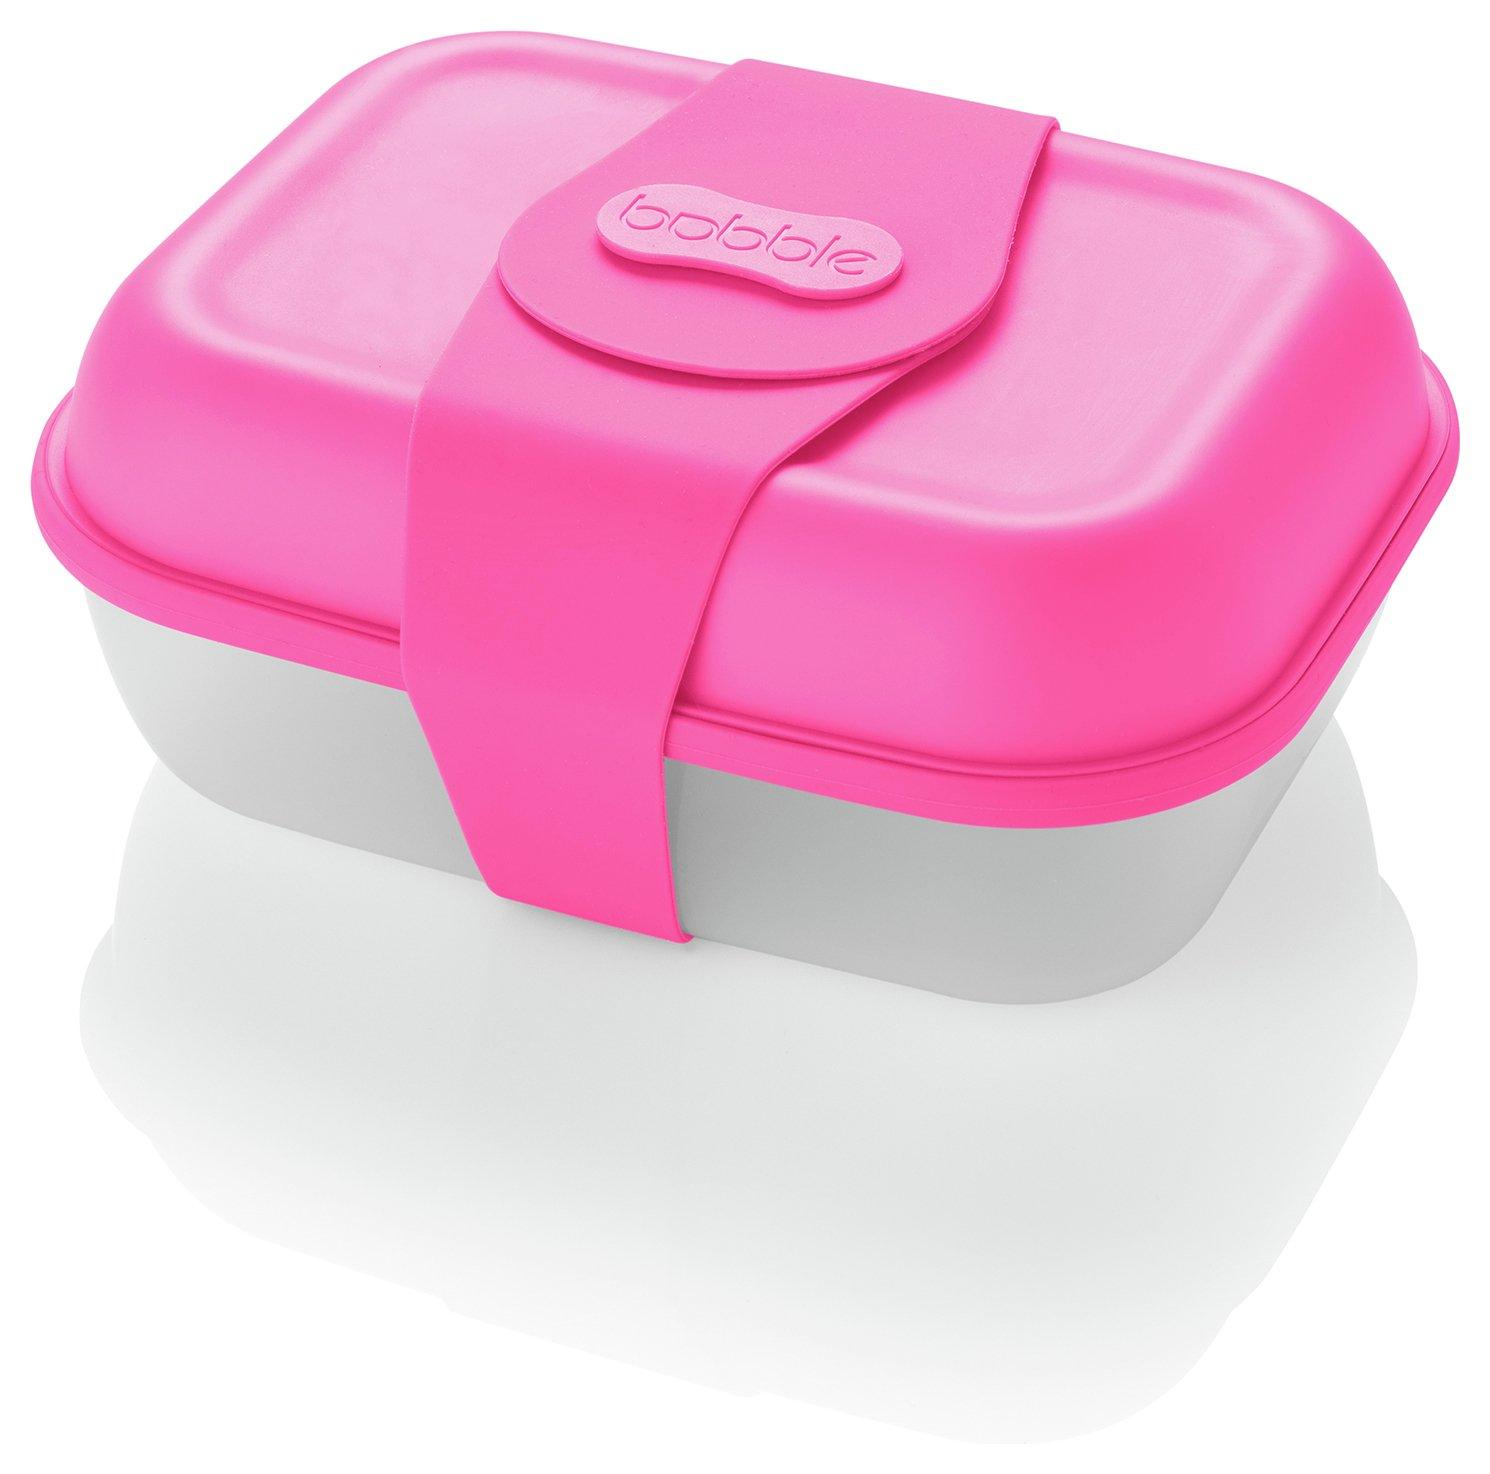 BobbleBox 1.8L Lunchbox - Pink